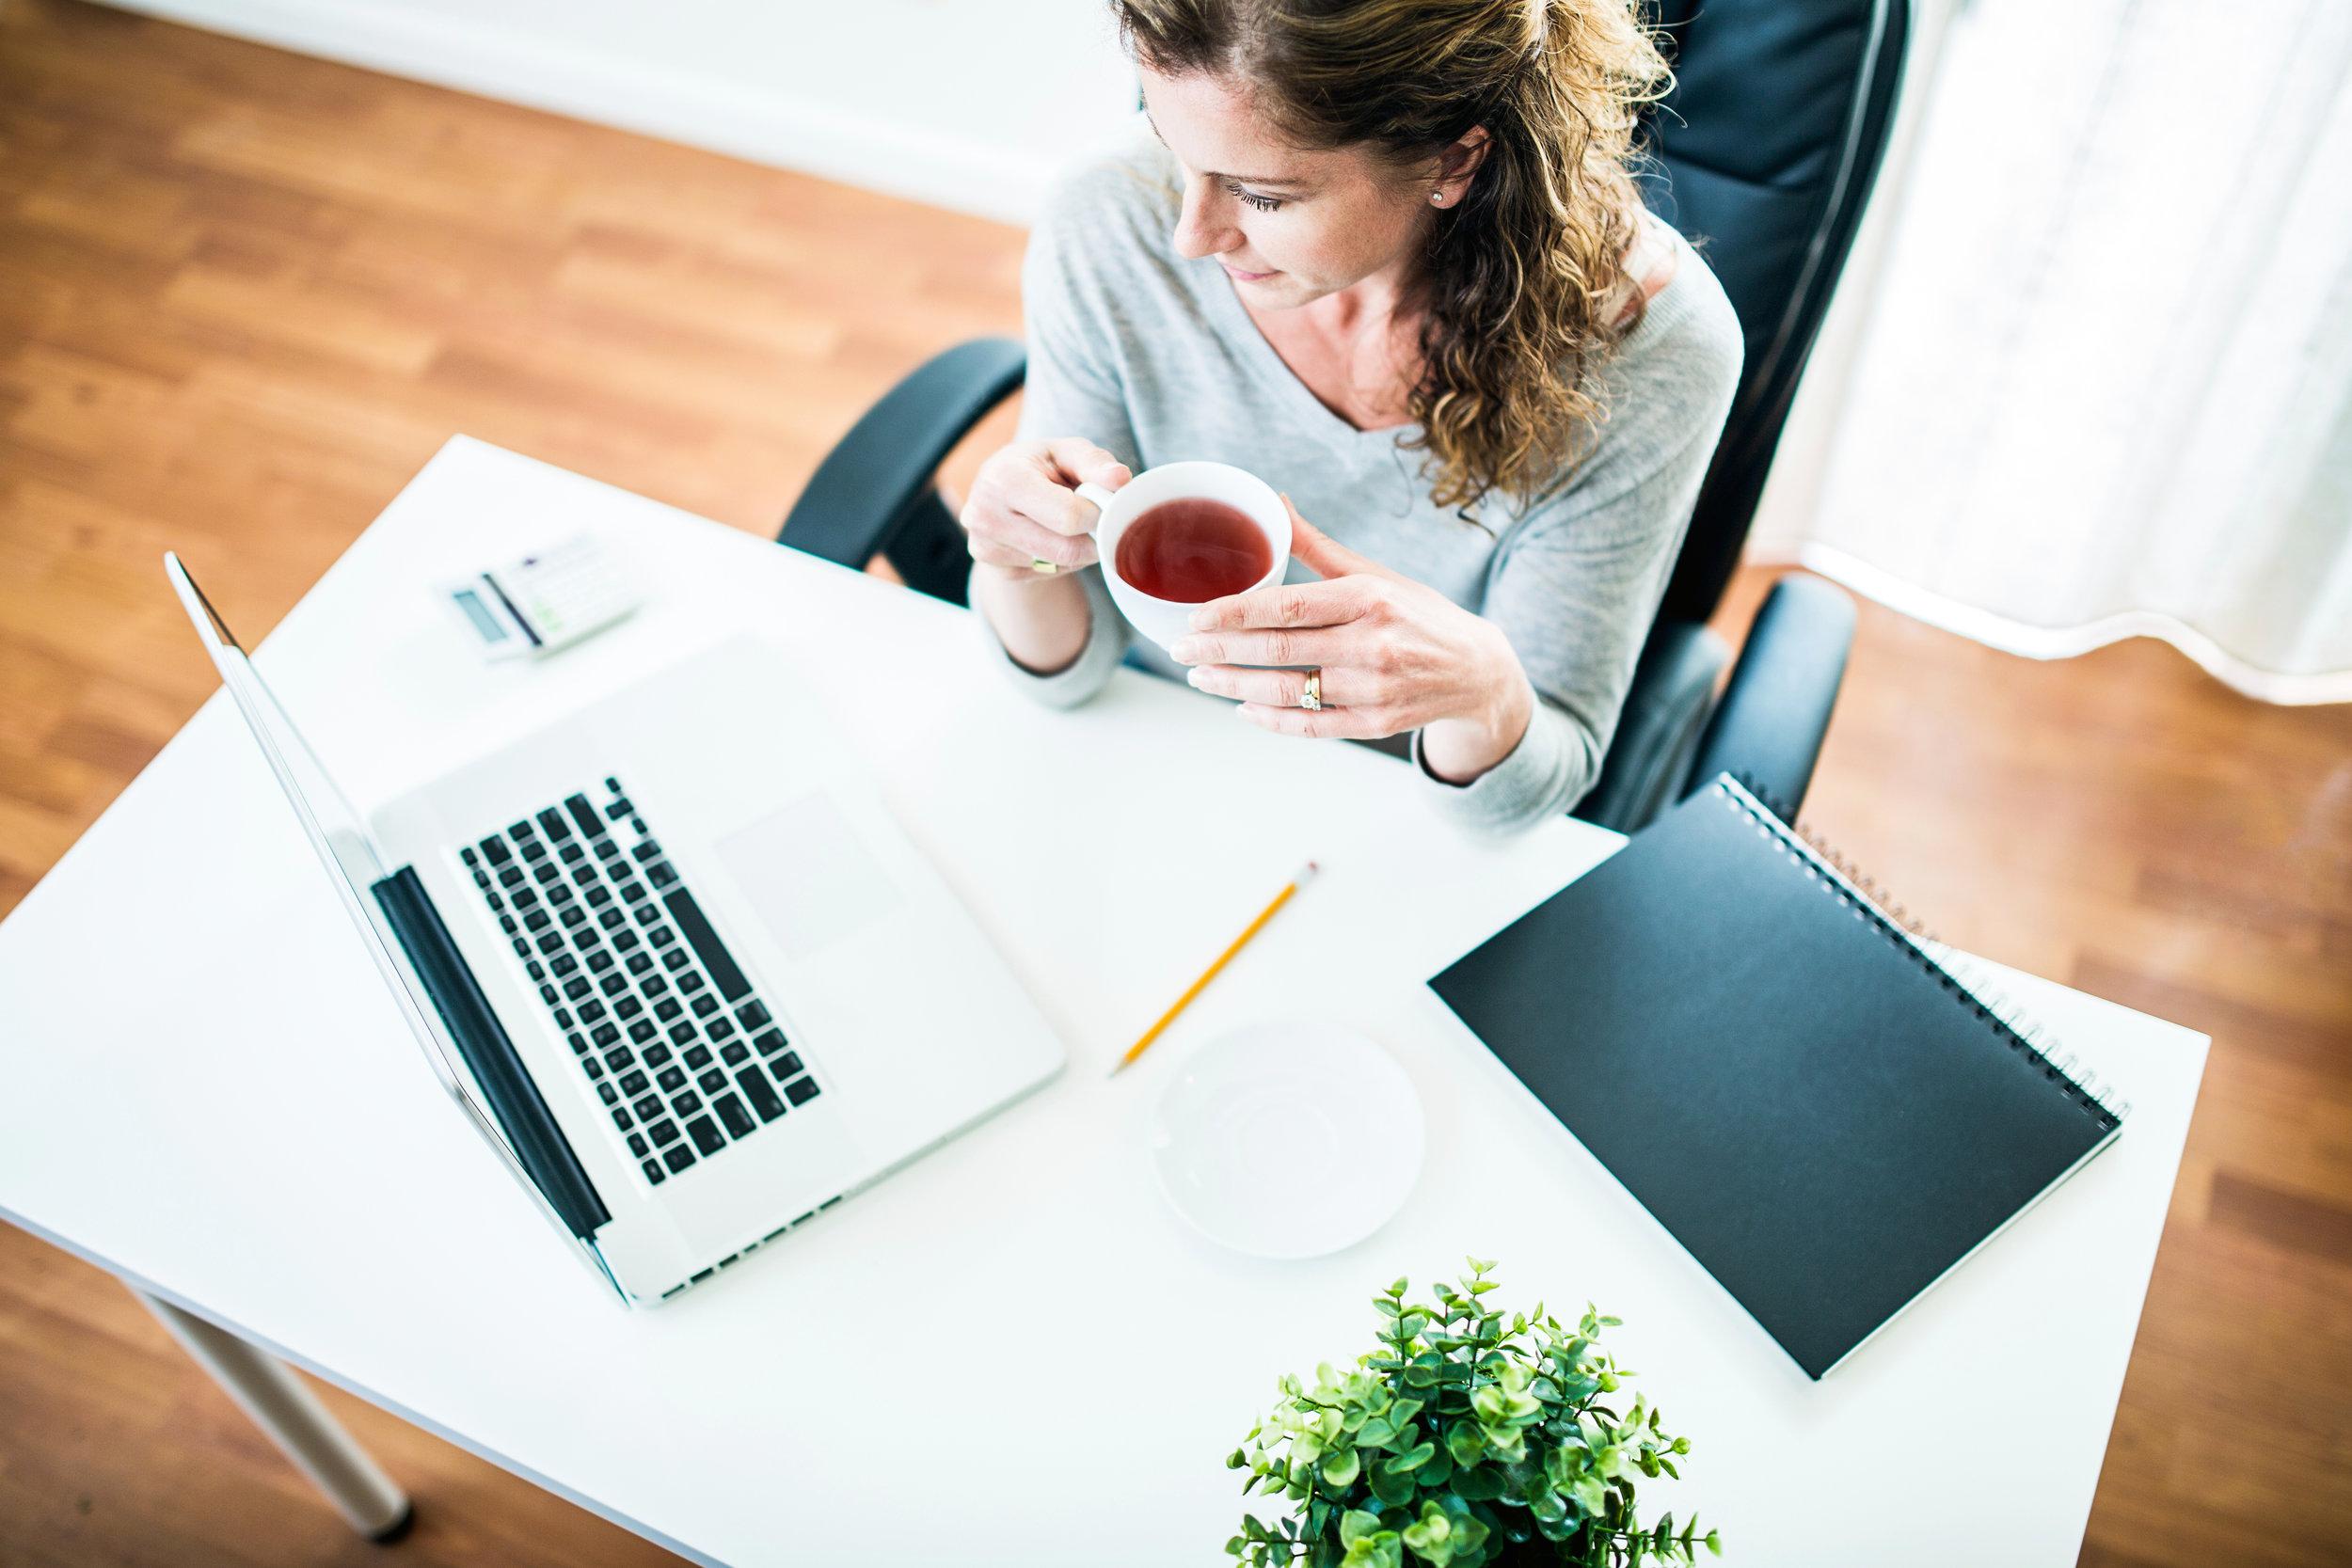 Tech Concierge Executive - enjoying seamless support while enjoying a cup of tea.jpg